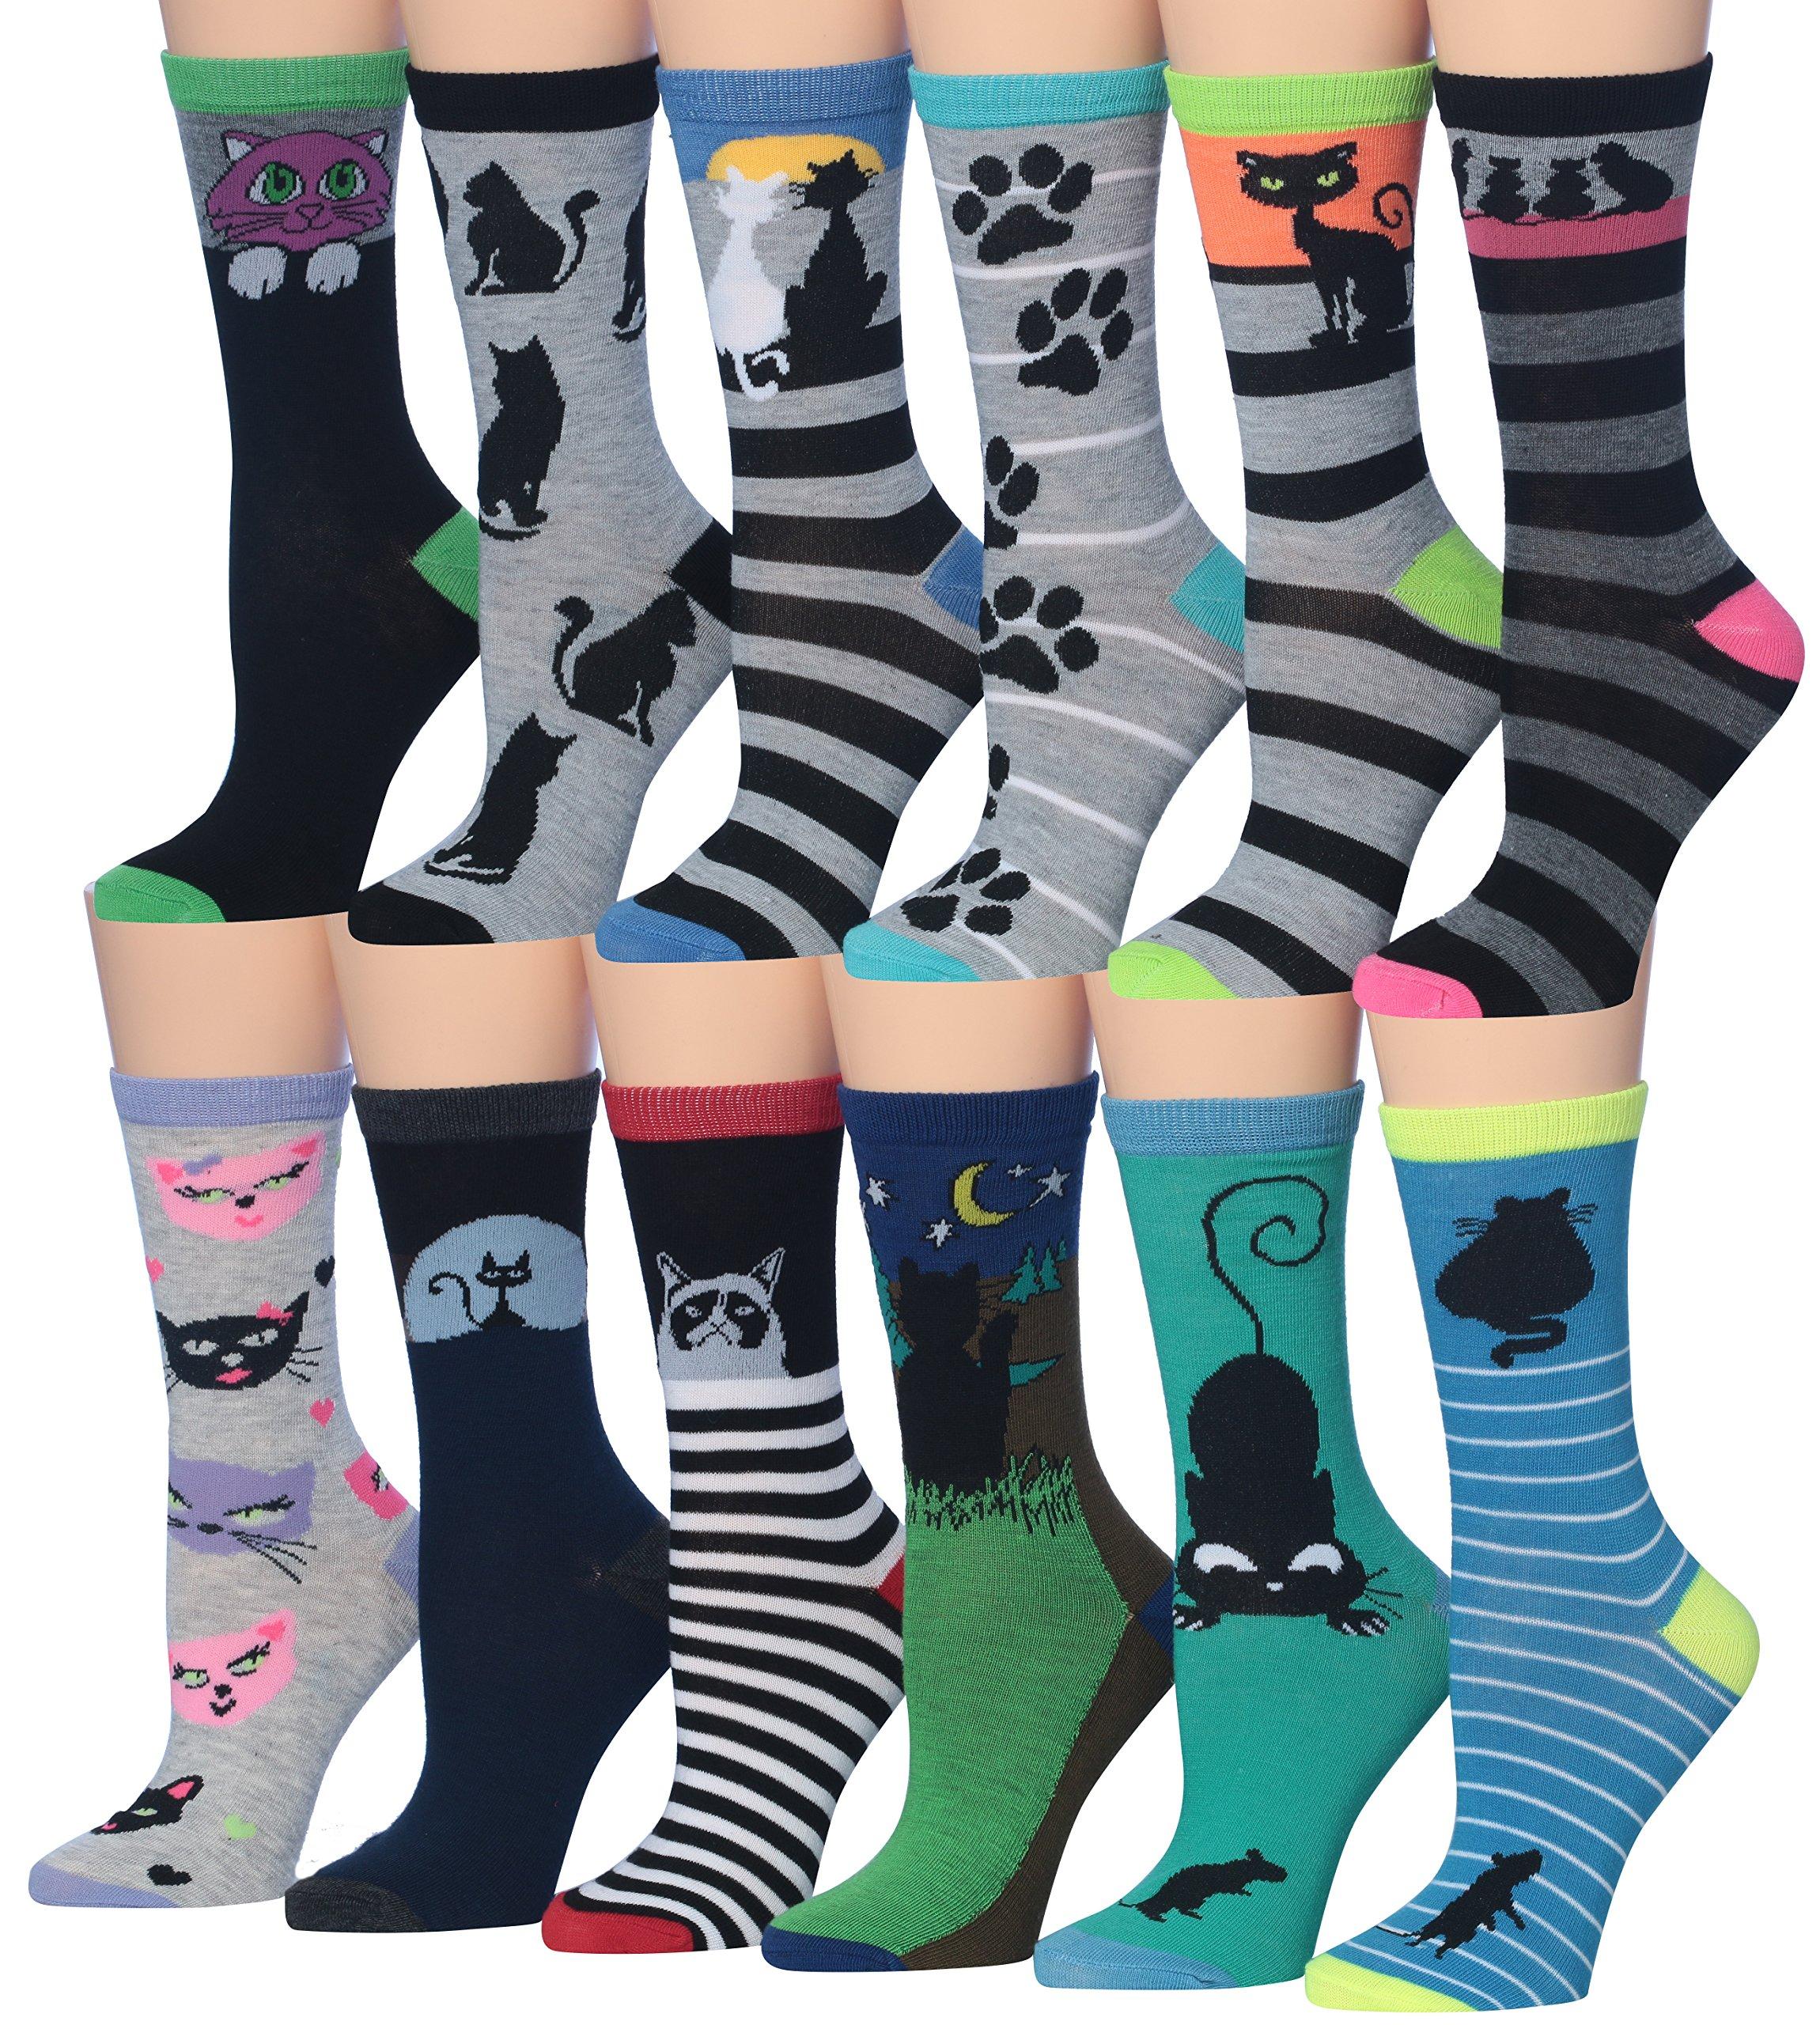 Tipi Toe Women's 12-Pairs Fashion Crew Novelty Cat Socks, (sock size 9-11) Fits shoe size 5-9, W51-AB